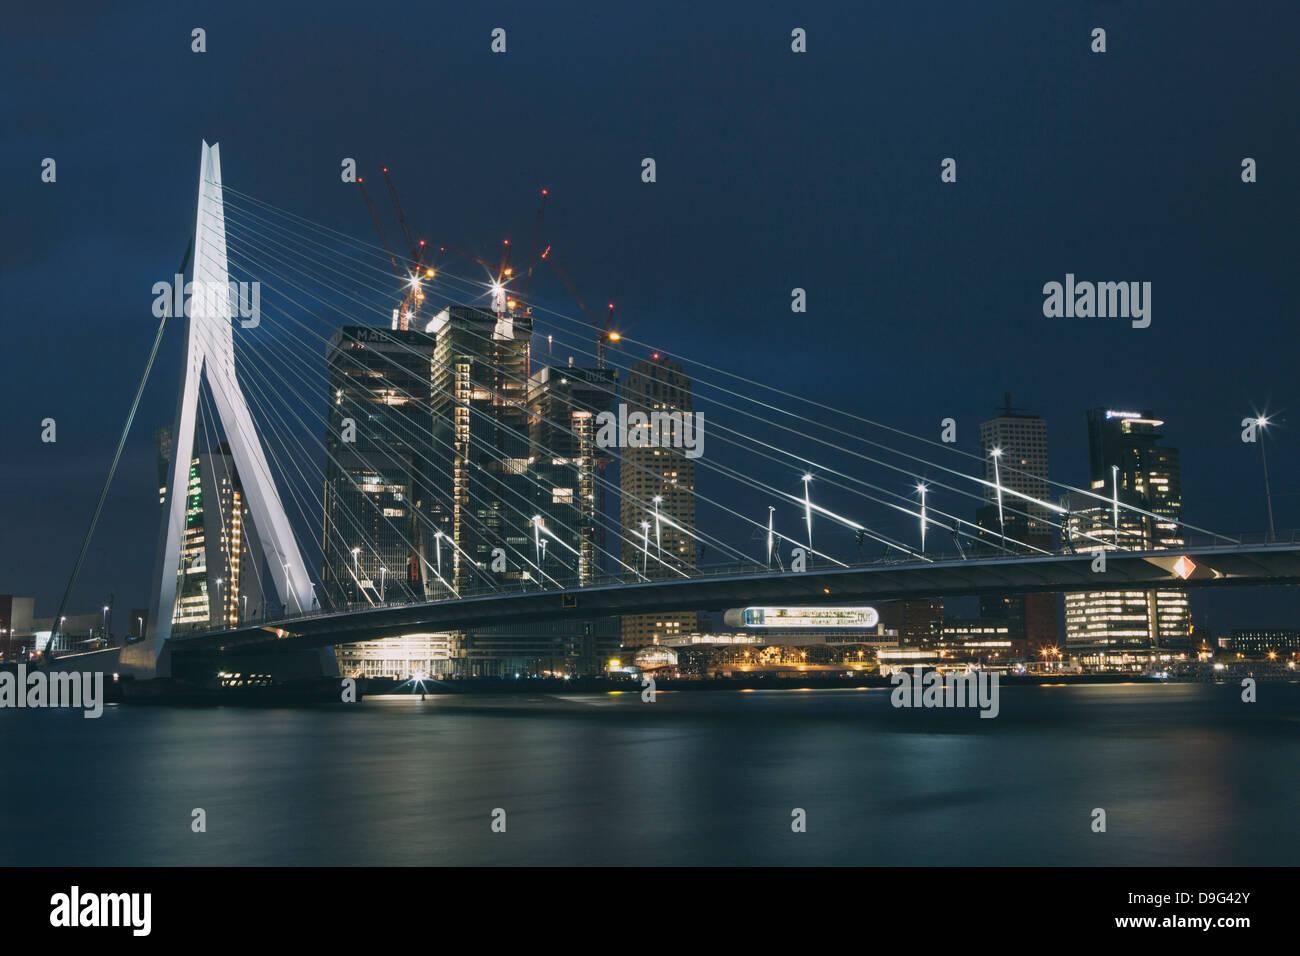 Erasmusbrug (Erasmus Bridge) crossing the Nieuwe Maas River, at night, Rotterdam, South Holland, The Netherlands Stock Photo